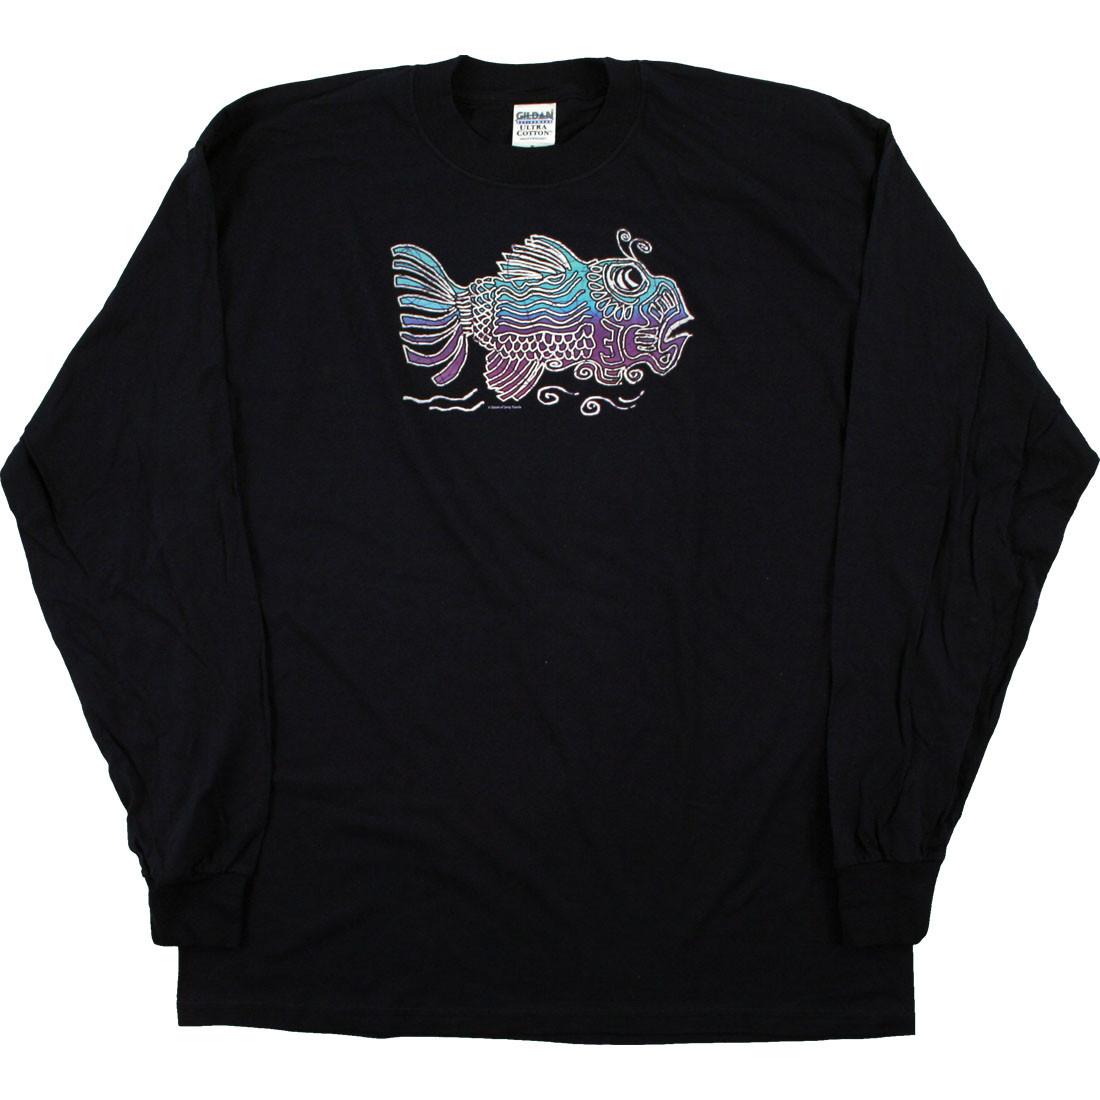 Jerry Fish Navy Long Sleeve T-Shirt